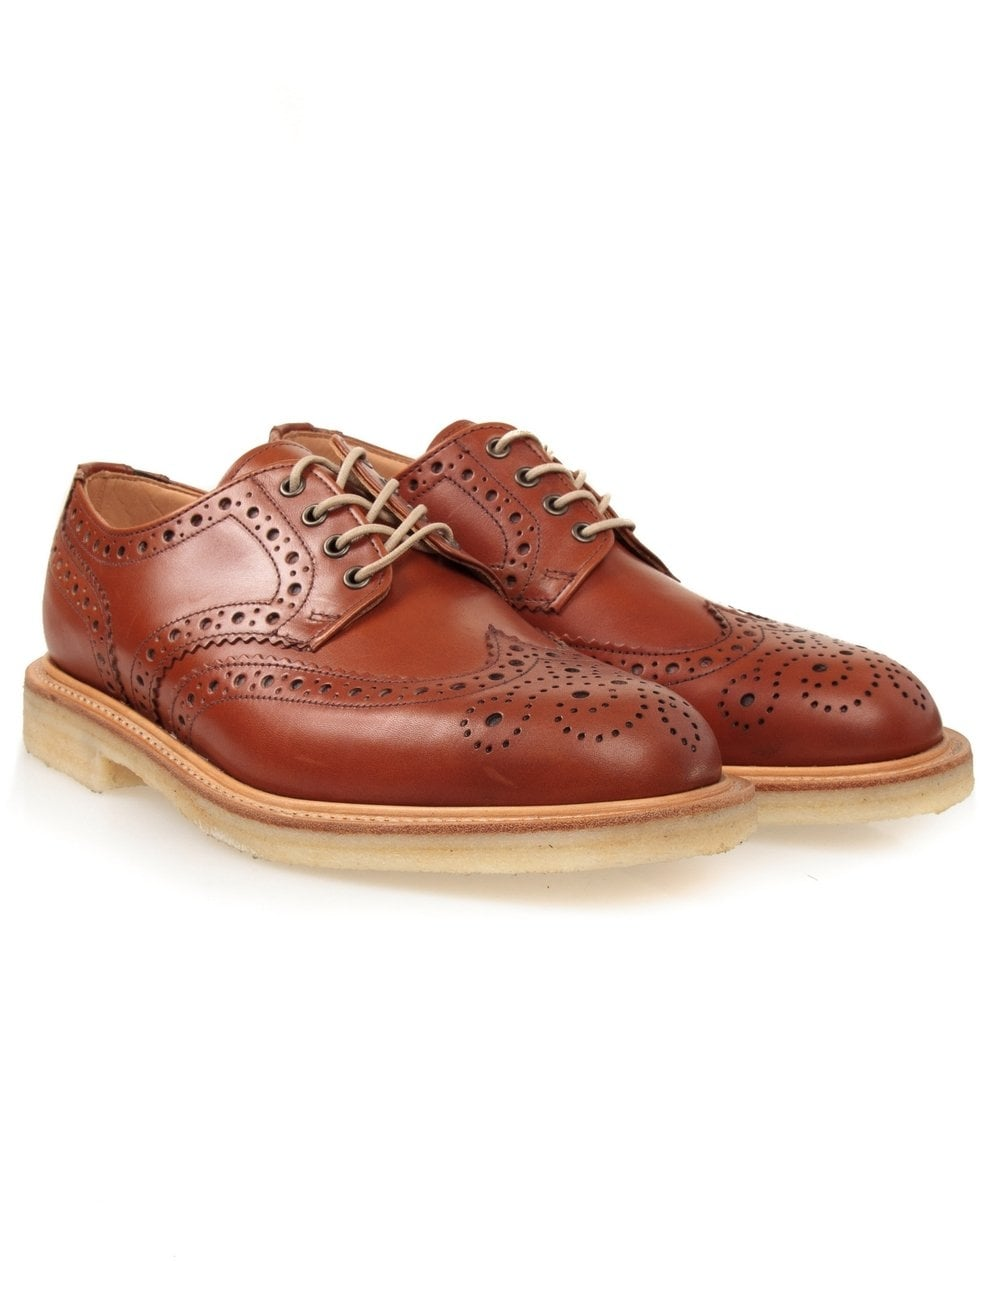 Sanders Alfie Brogue Shoes - Light Tan